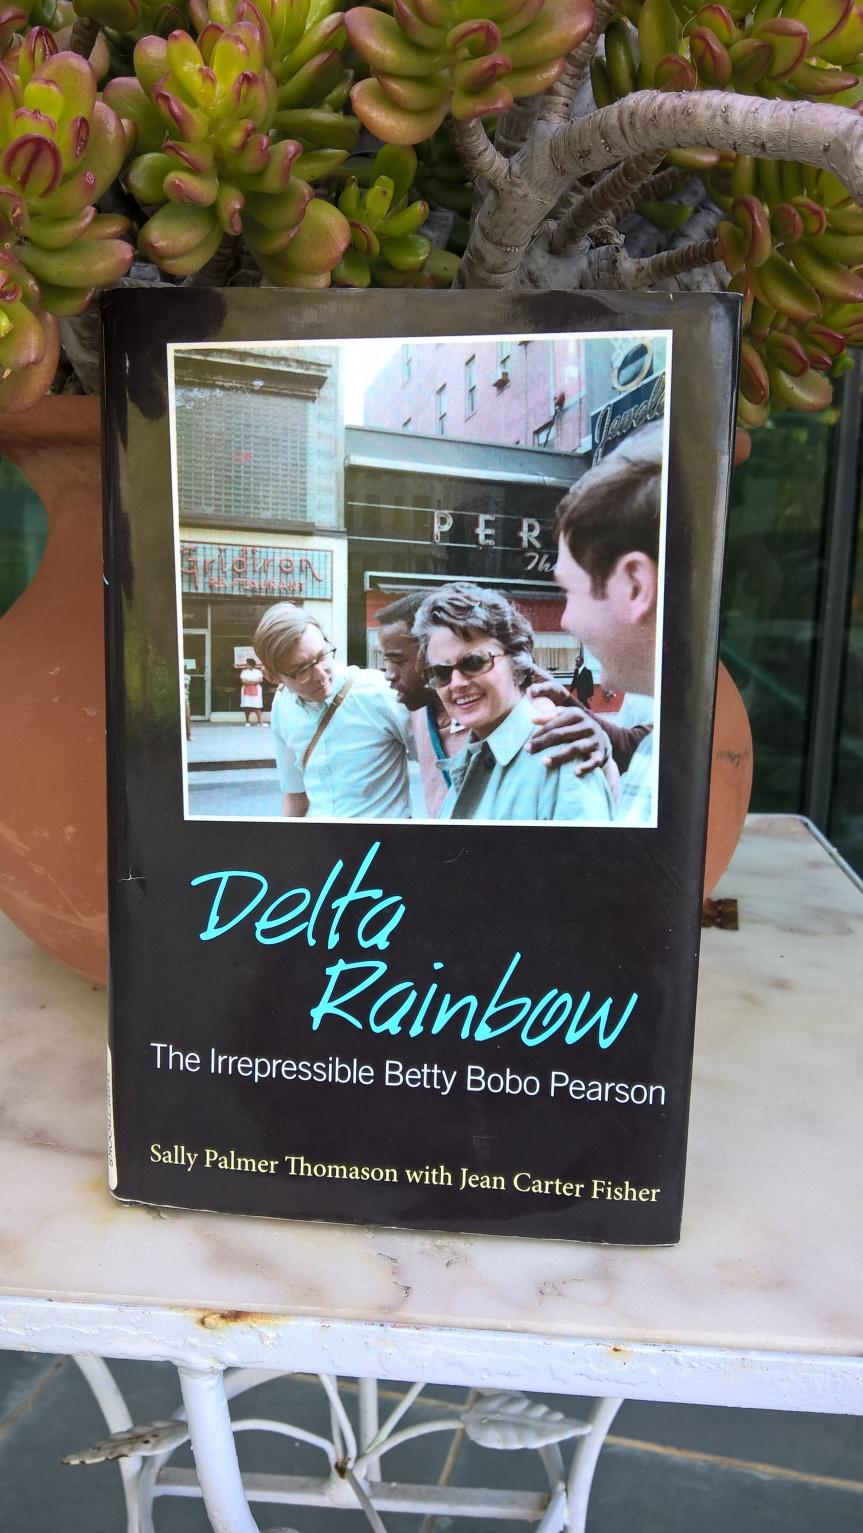 Delta Rainbow: The Irrepressible Betty Bobo Pearson by Sally Thomason and JeanFisher.